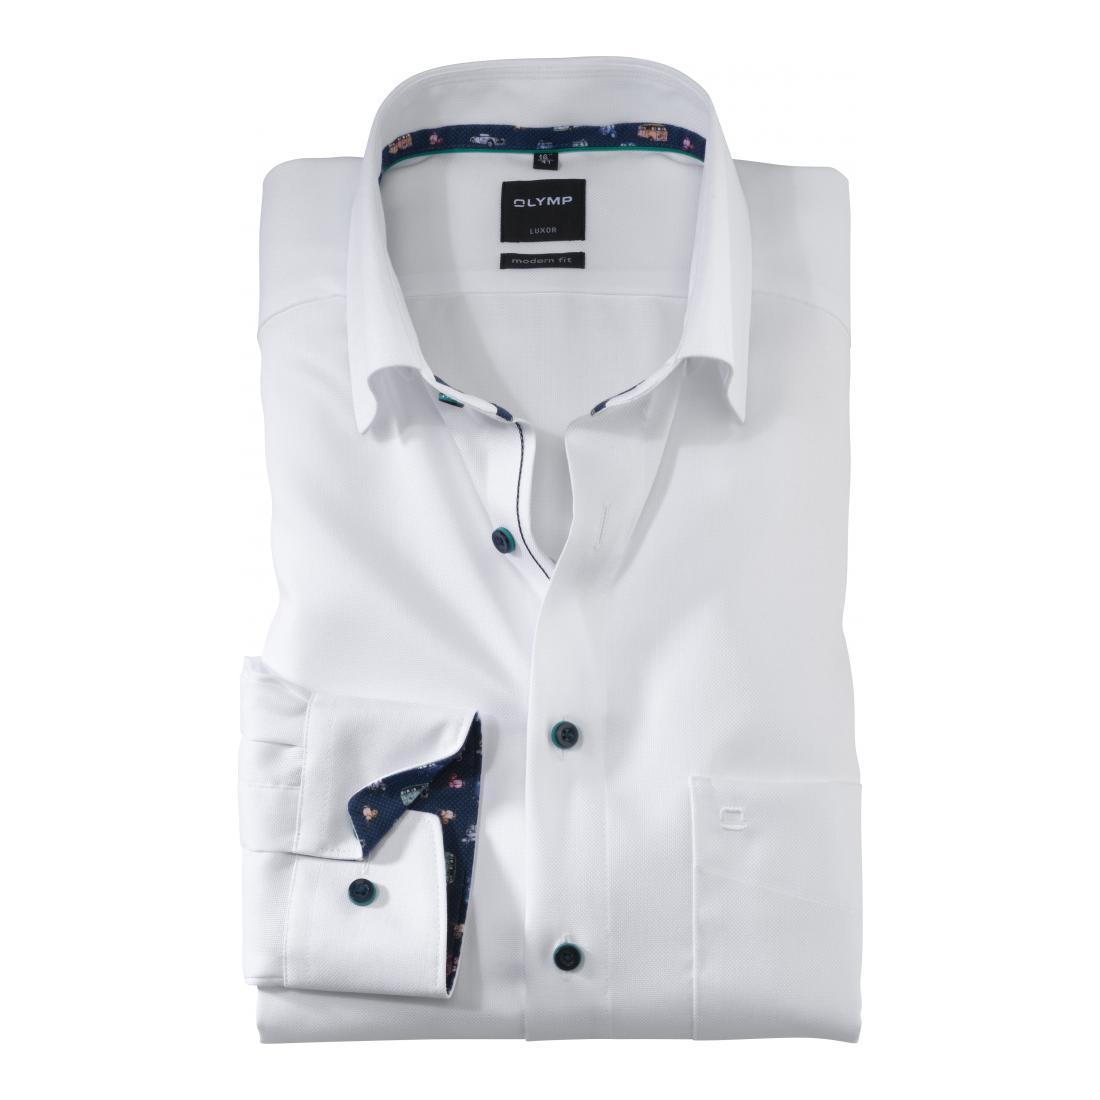 Olymp Business Hemden Herren 1268/74 Hemden